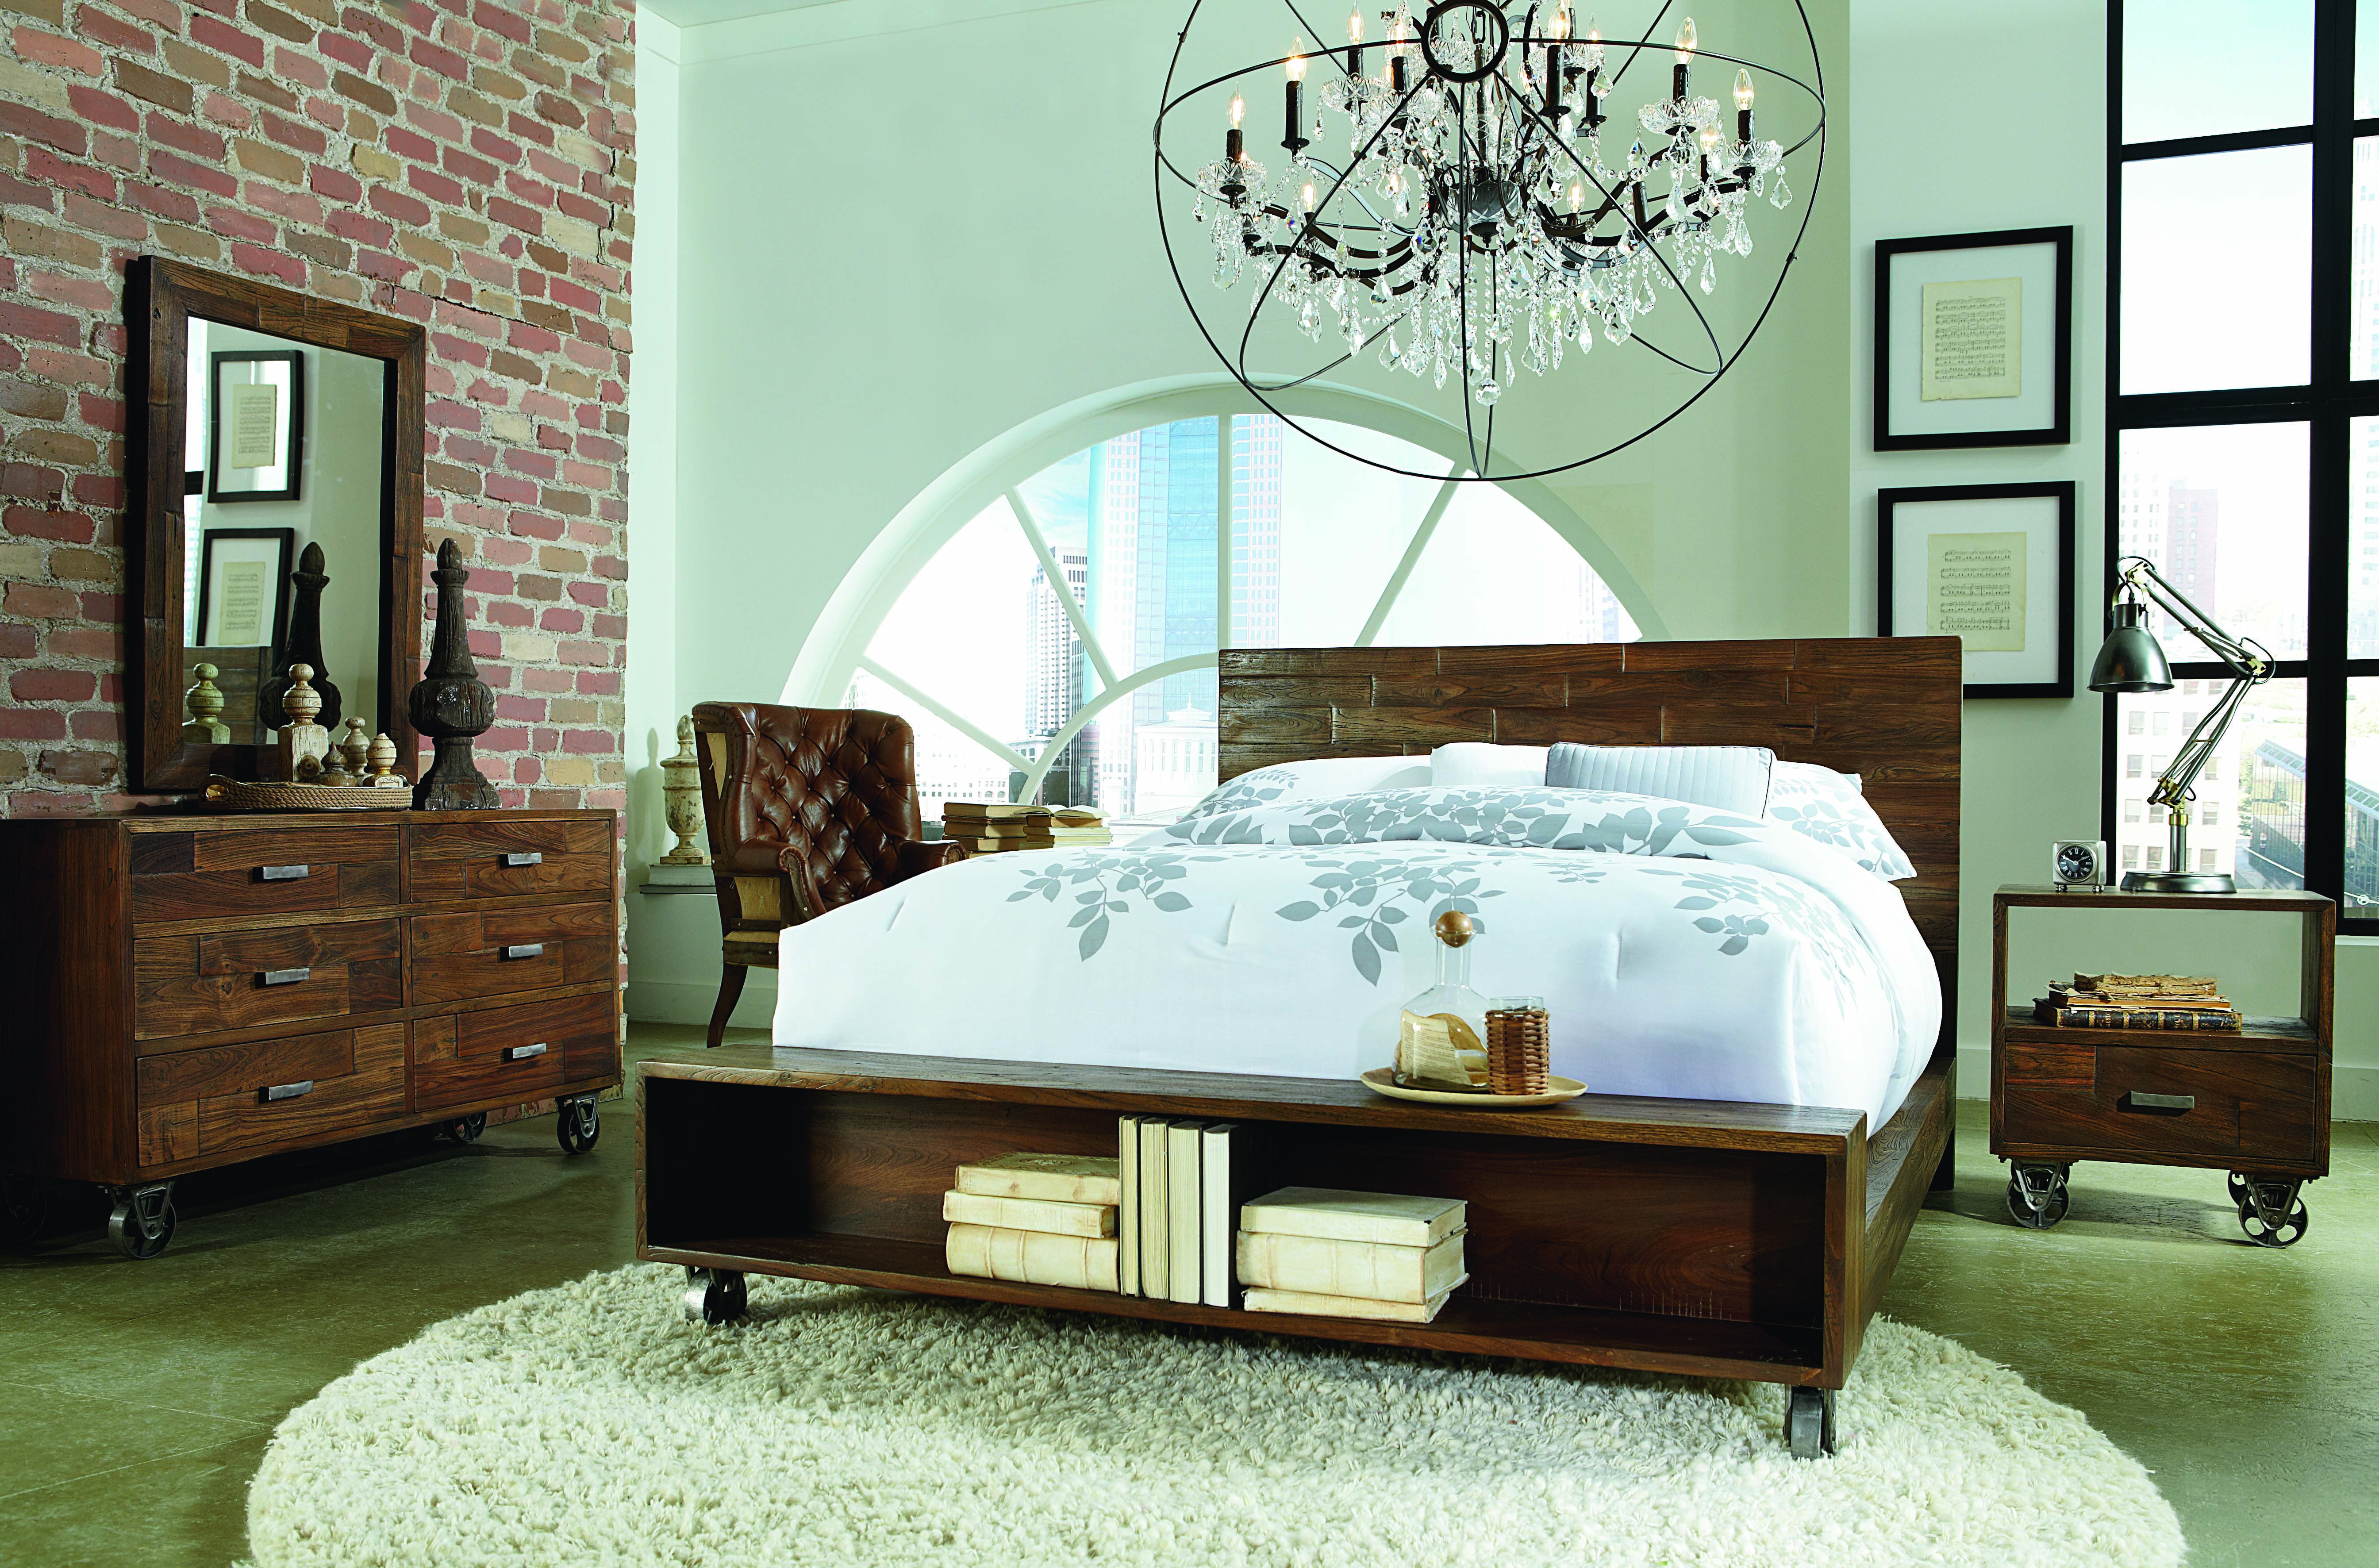 Denison tx industrial style industrial loft beds - Industrial style bedroom furniture ...